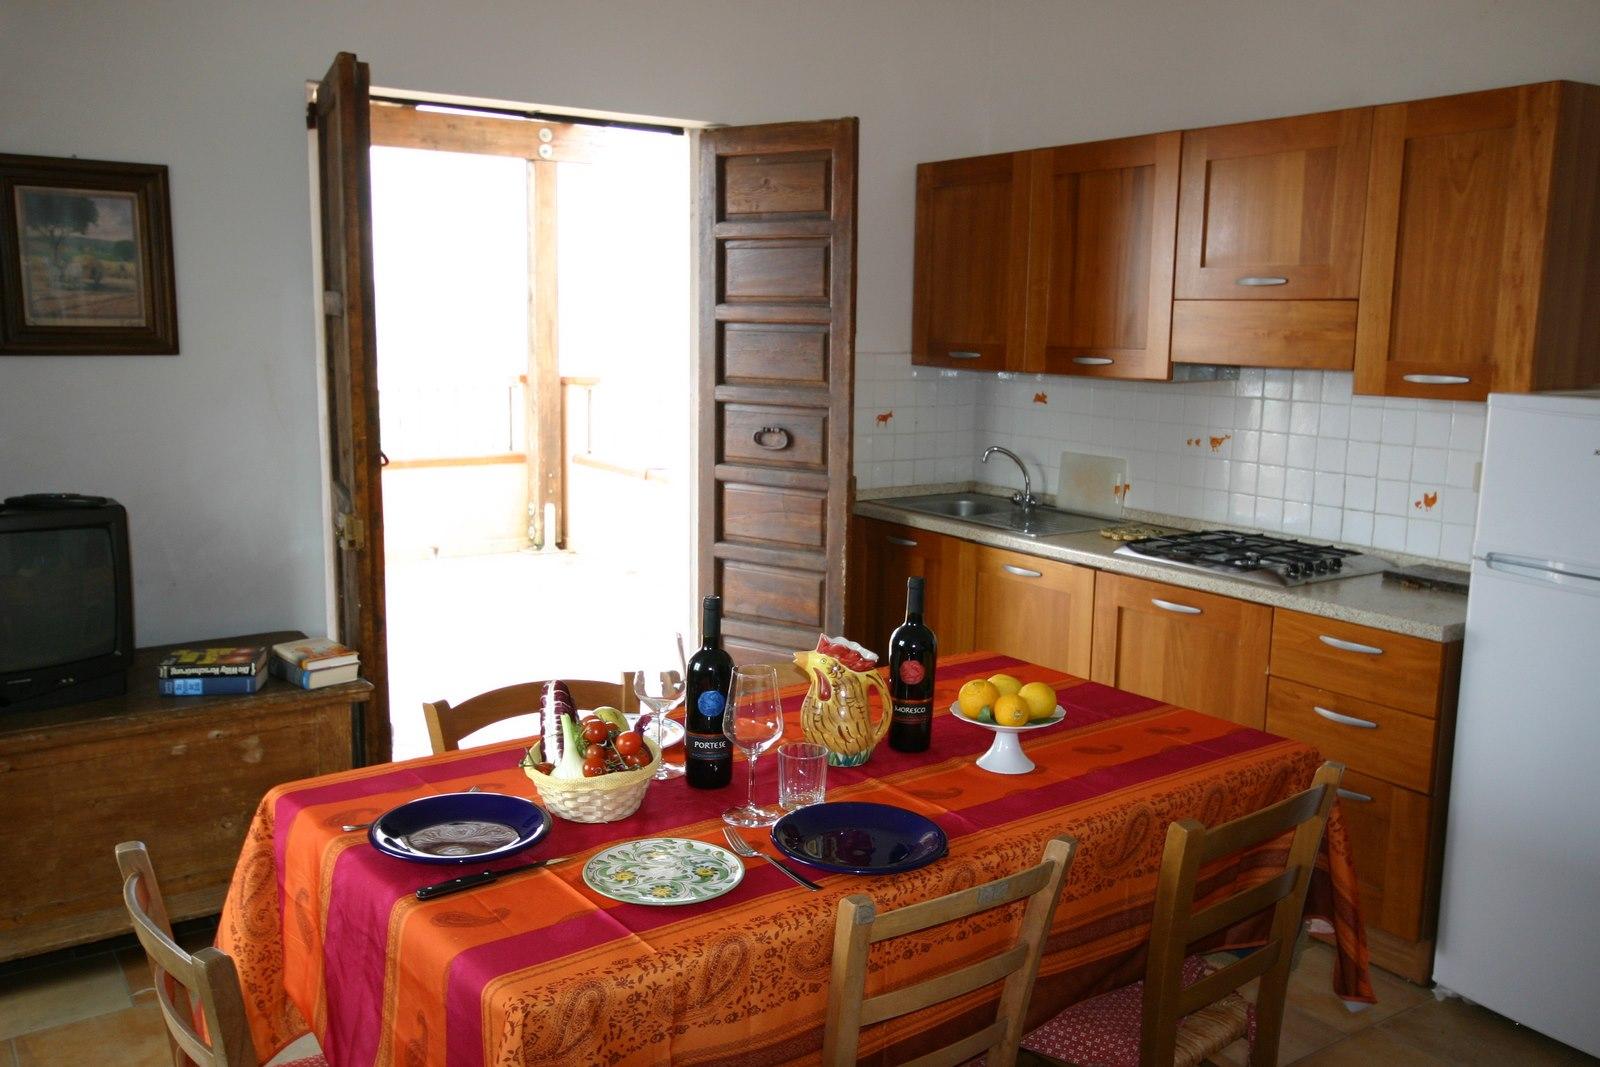 Ferienwohnung Podere Paolo-Terrazzo (870415), Fermo, Fermo, Marken, Italien, Bild 20